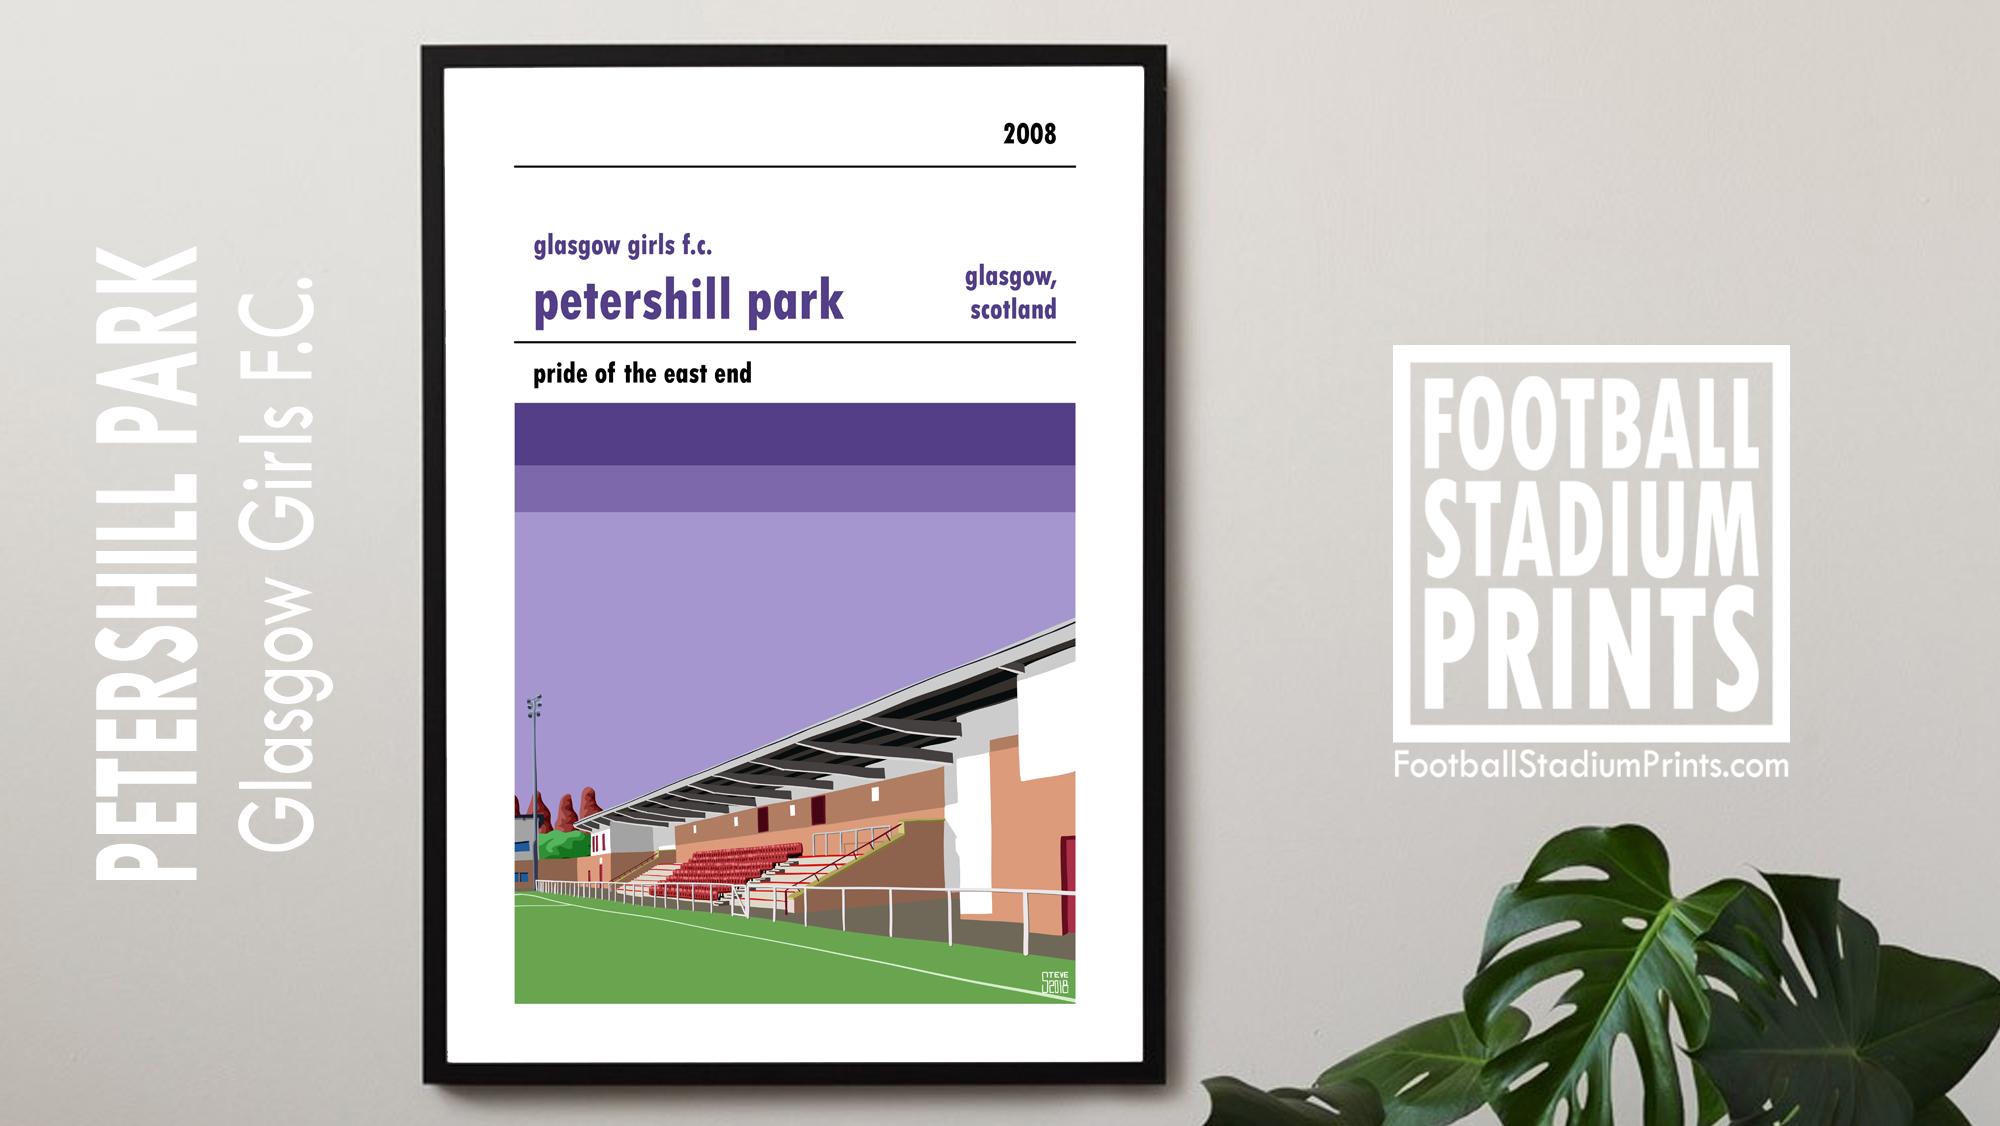 SWPL Series – Glasgow Girls – Petershill Park